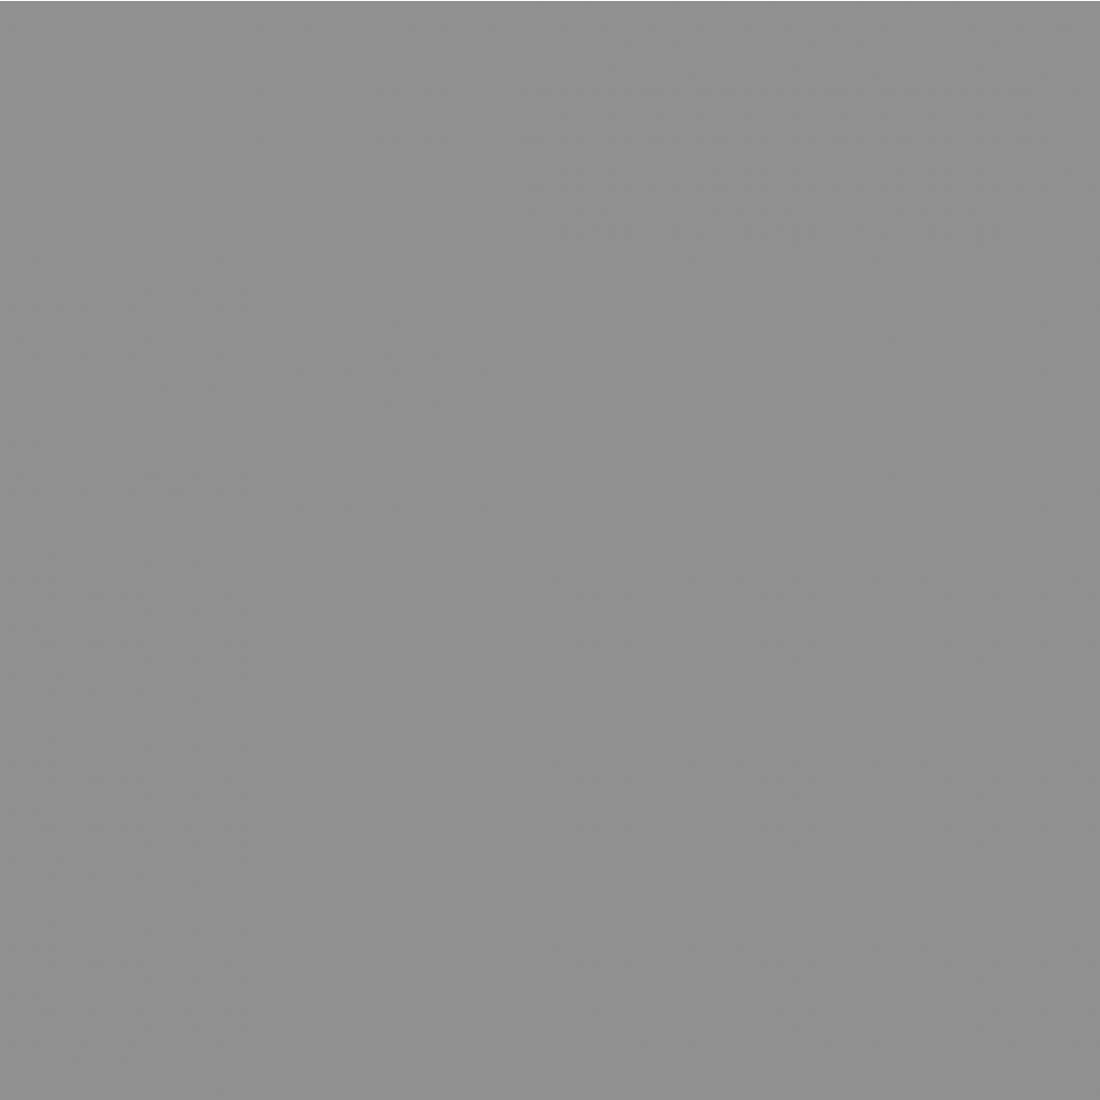 Porcelanato Elizabeth Smoke 62,5 x 62,5 HD Polido Ref 01040009002PIM